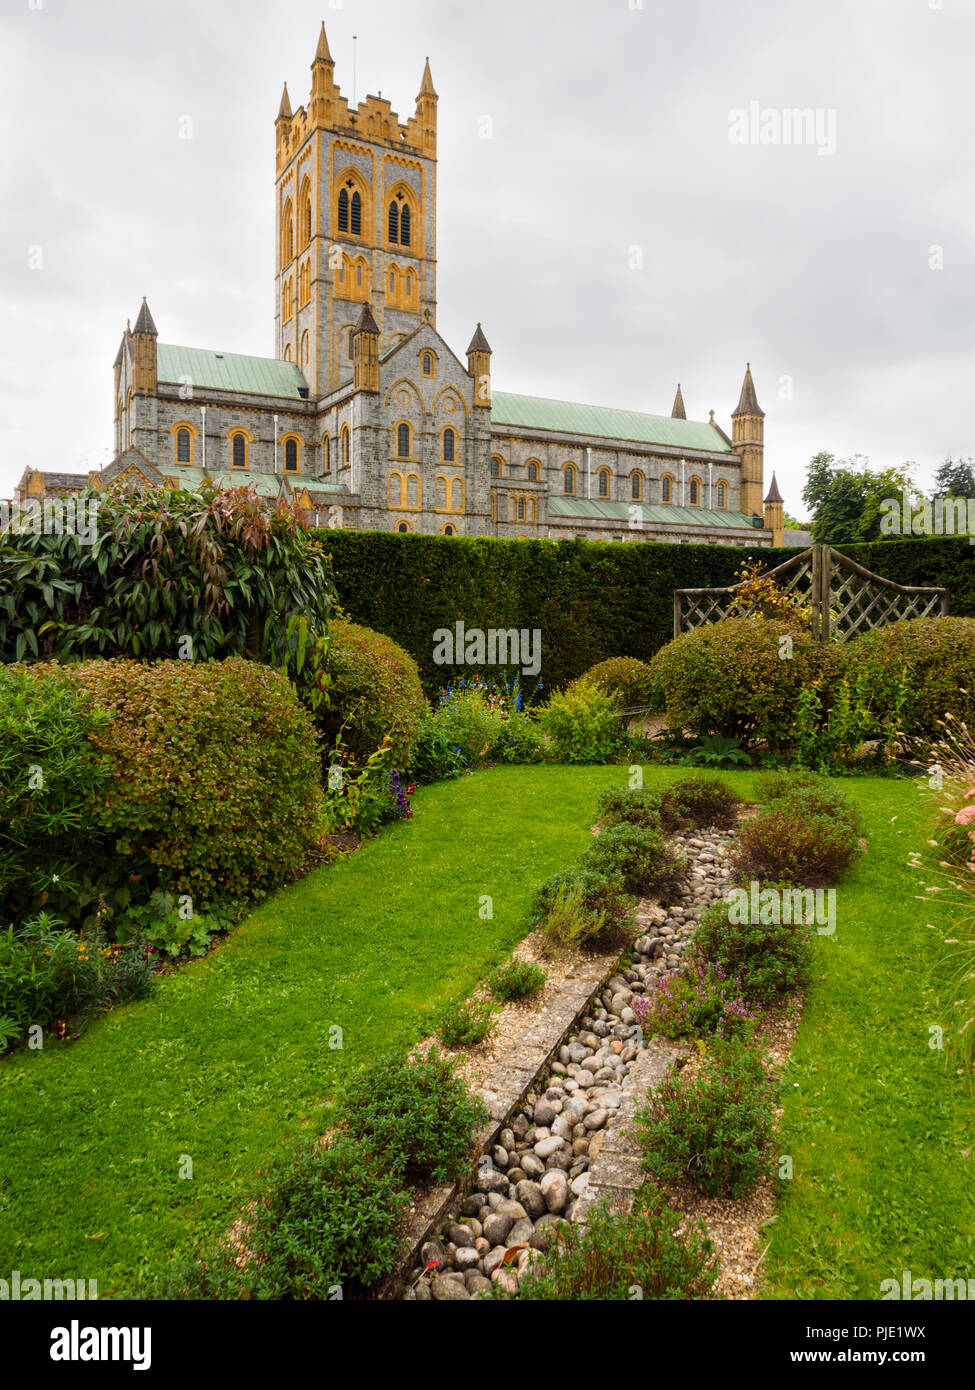 Benedictine Buckfast Abbey Church side view from the Sensory Garden - Stock Image